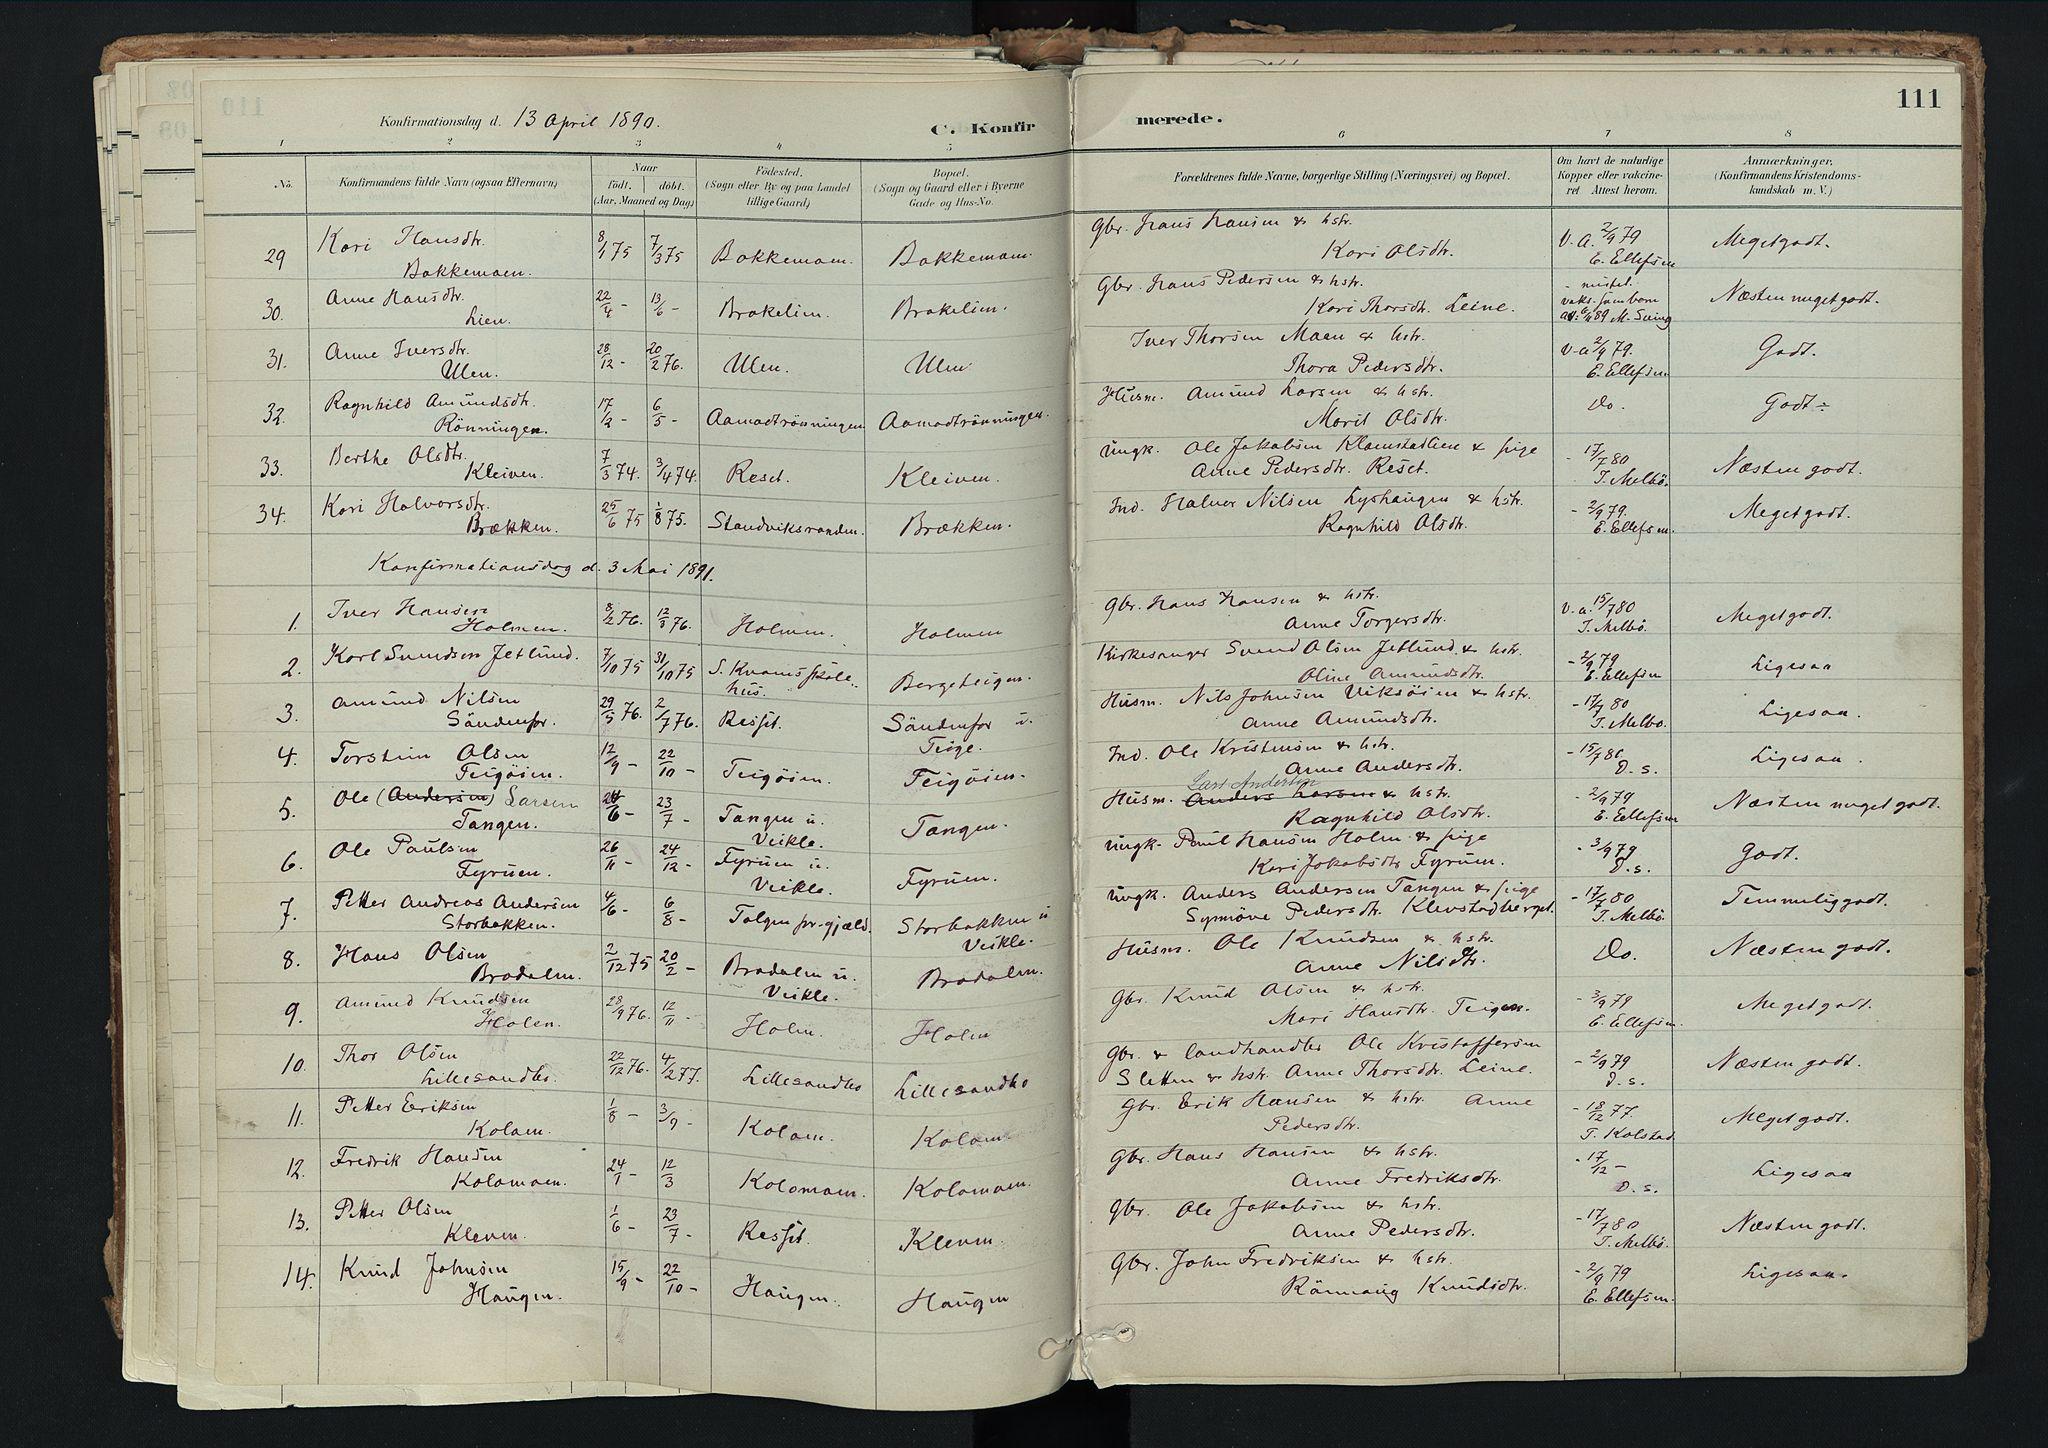 SAH, Nord-Fron prestekontor, Ministerialbok nr. 3, 1884-1914, s. 111